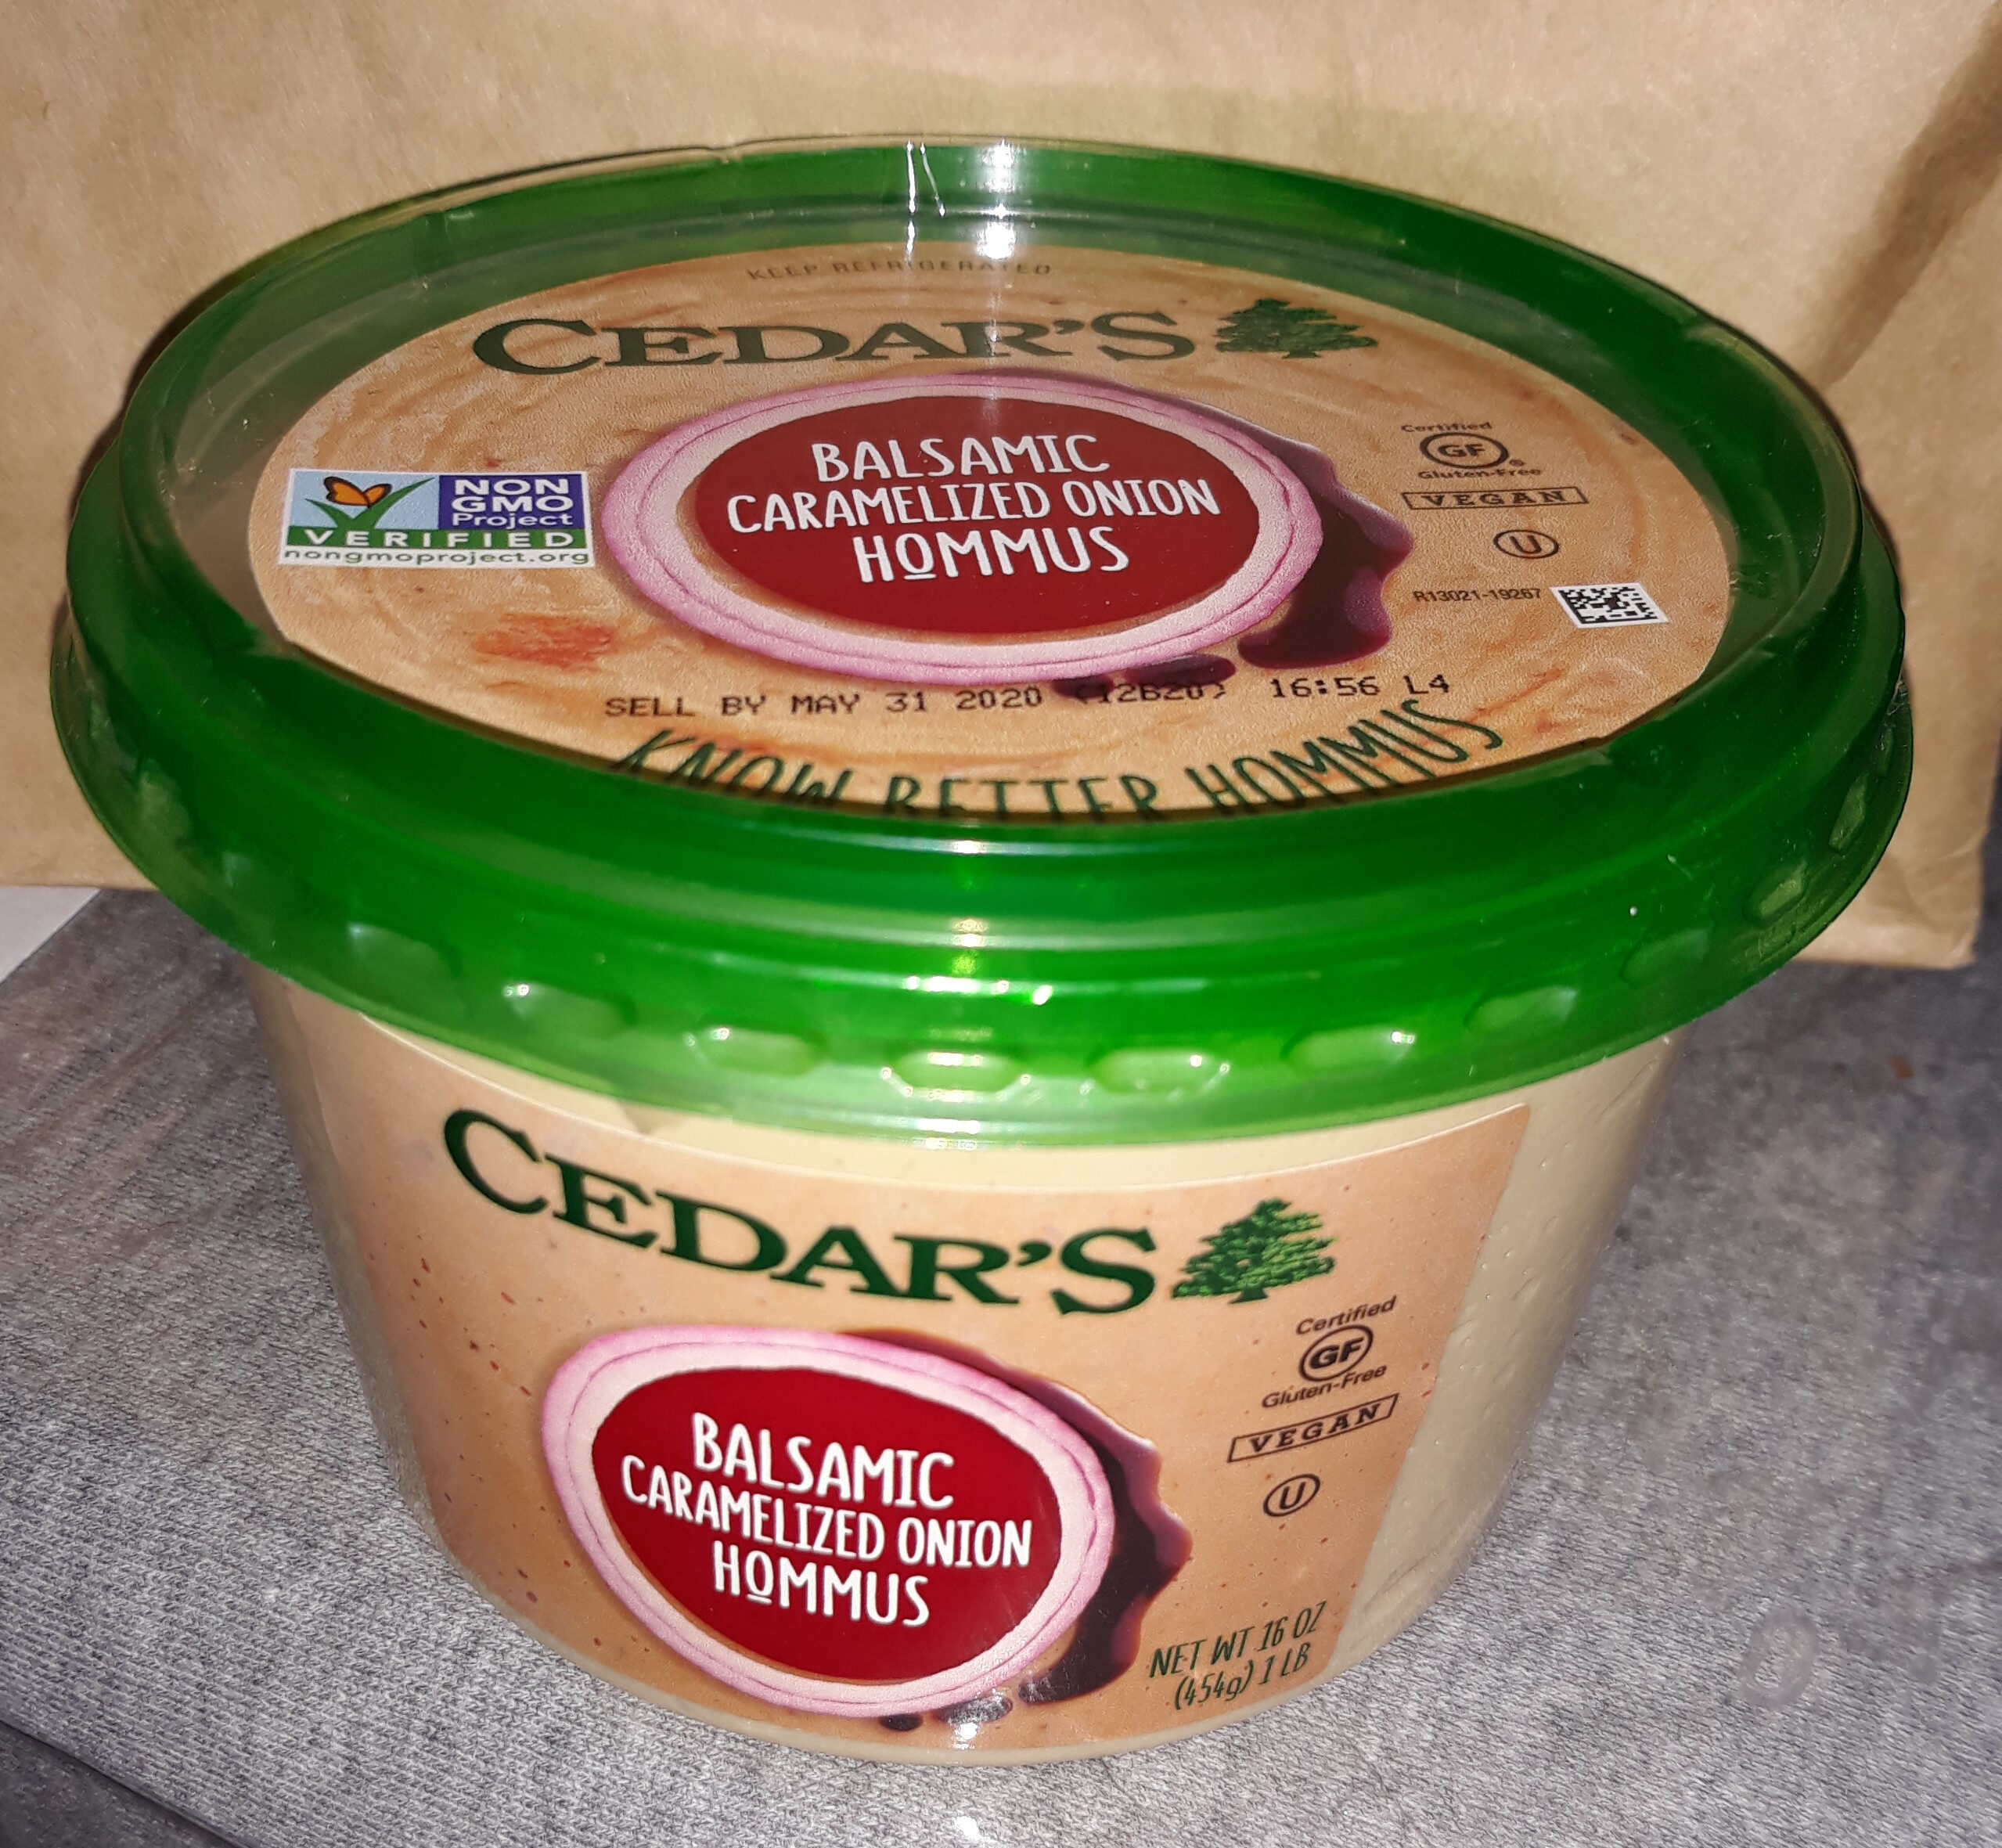 Cedar's, hommus, balsamic caramelized onion - Product - en